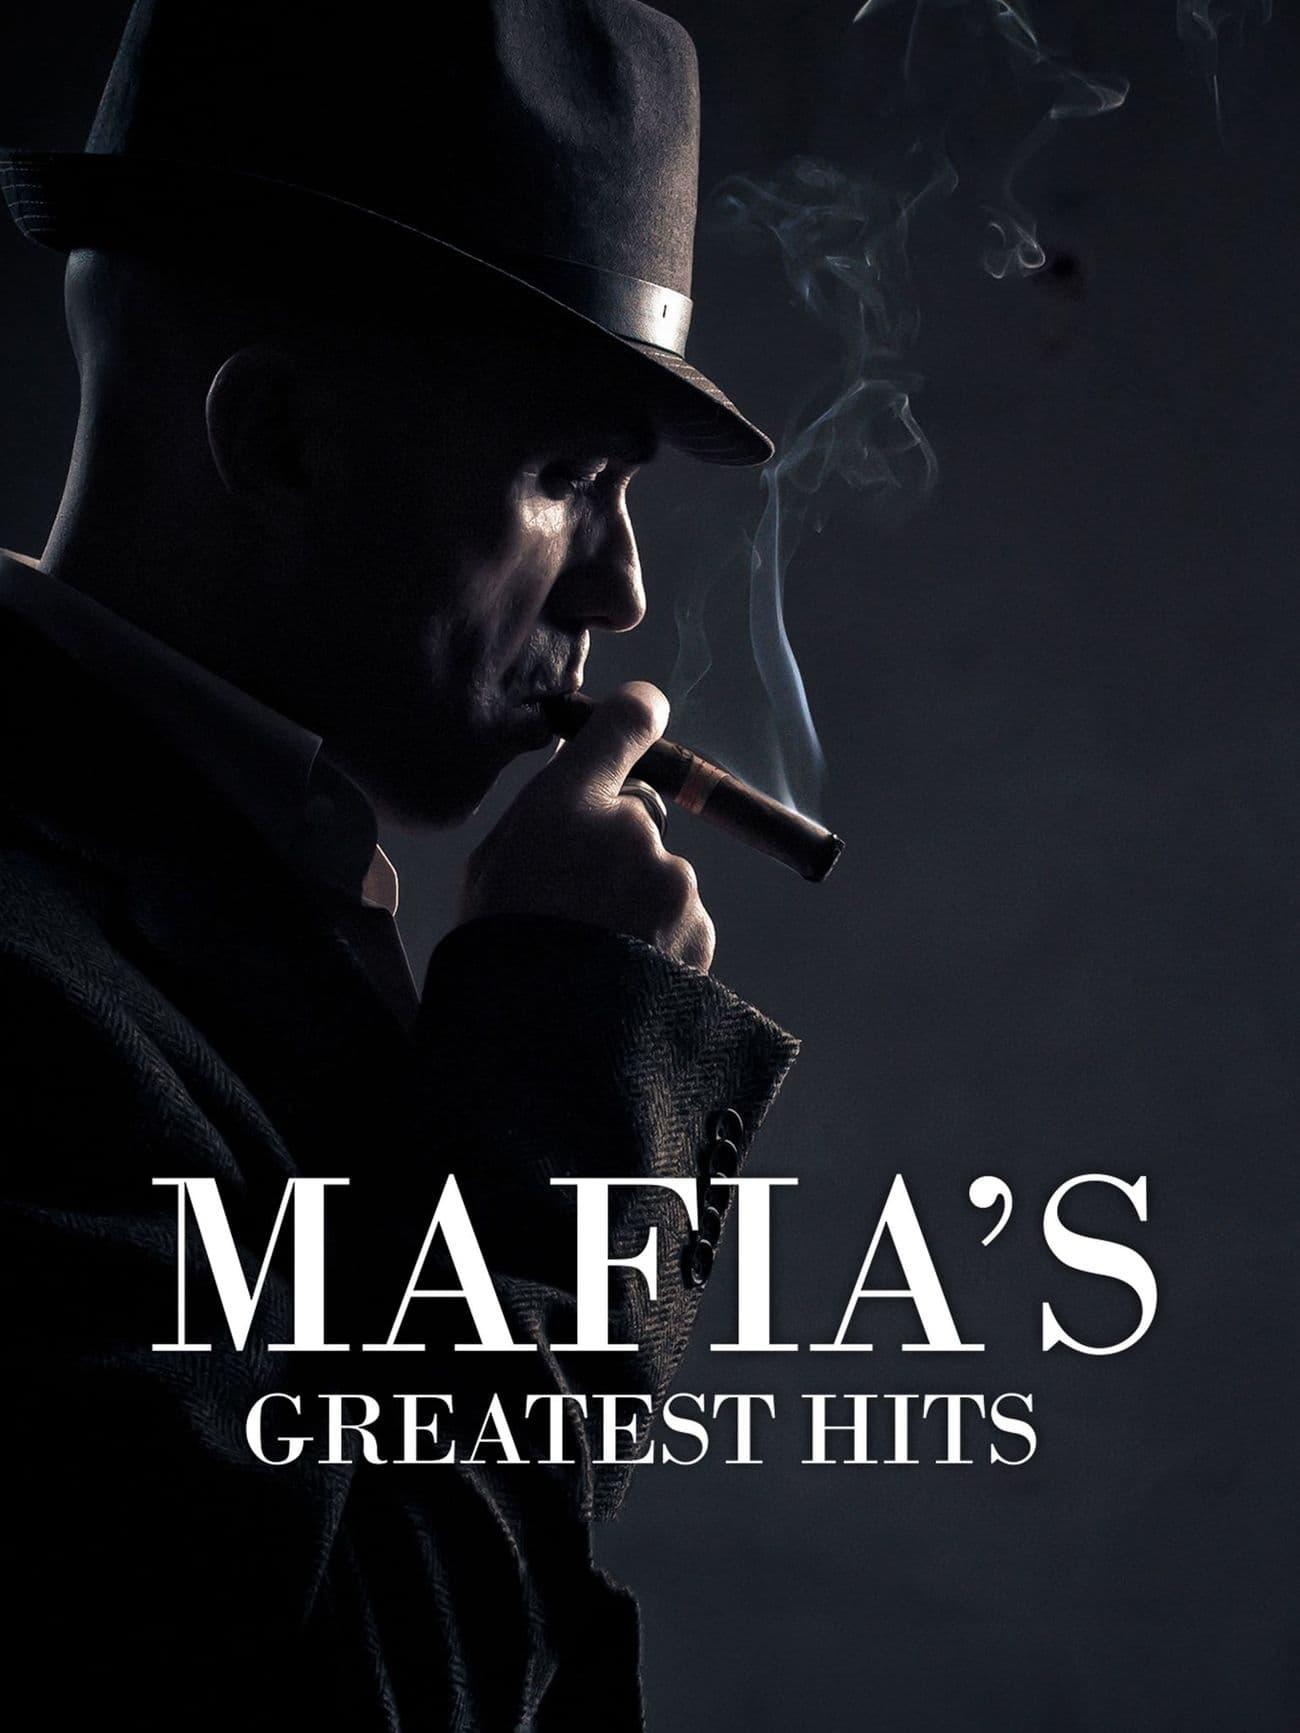 Les stars de la mafia